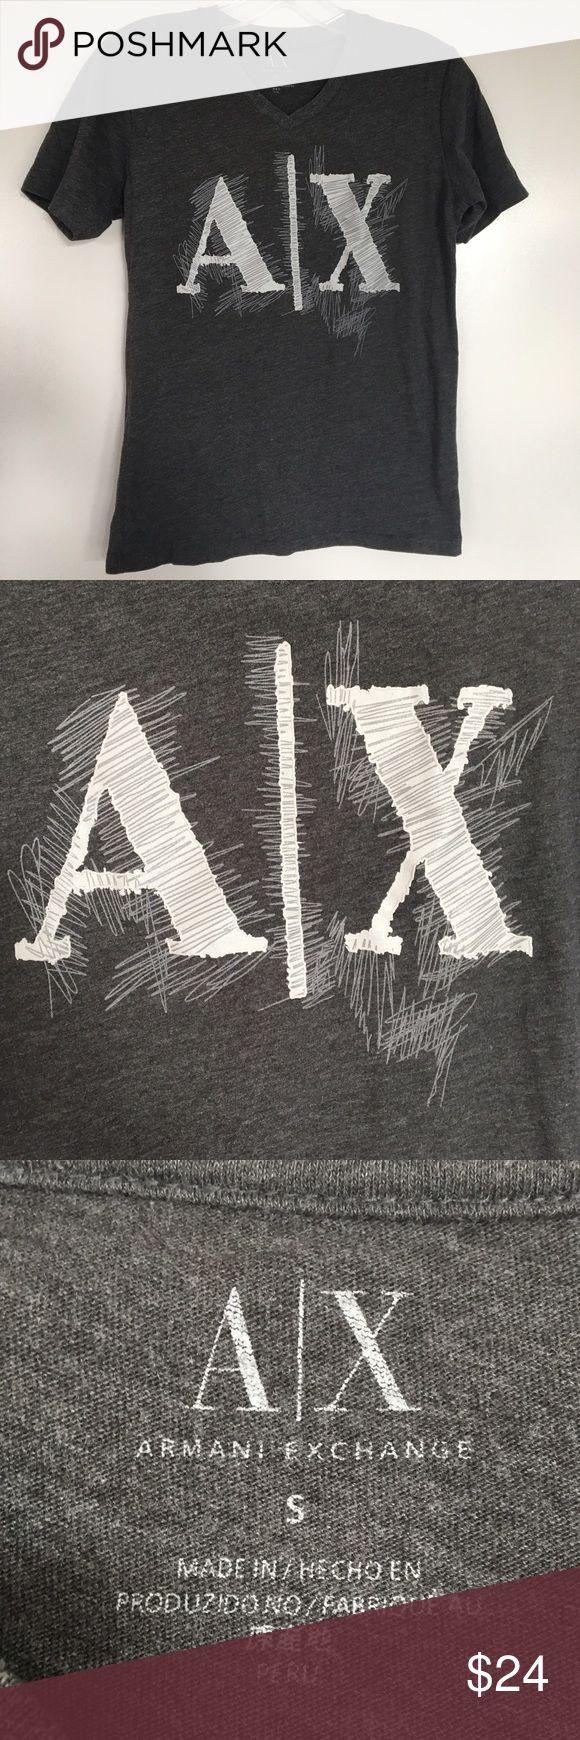 A/X Armani exchange T-shirt small A/X Armani exchange T-shirt small A/X Armani Exchange Tops Tees - Short Sleeve